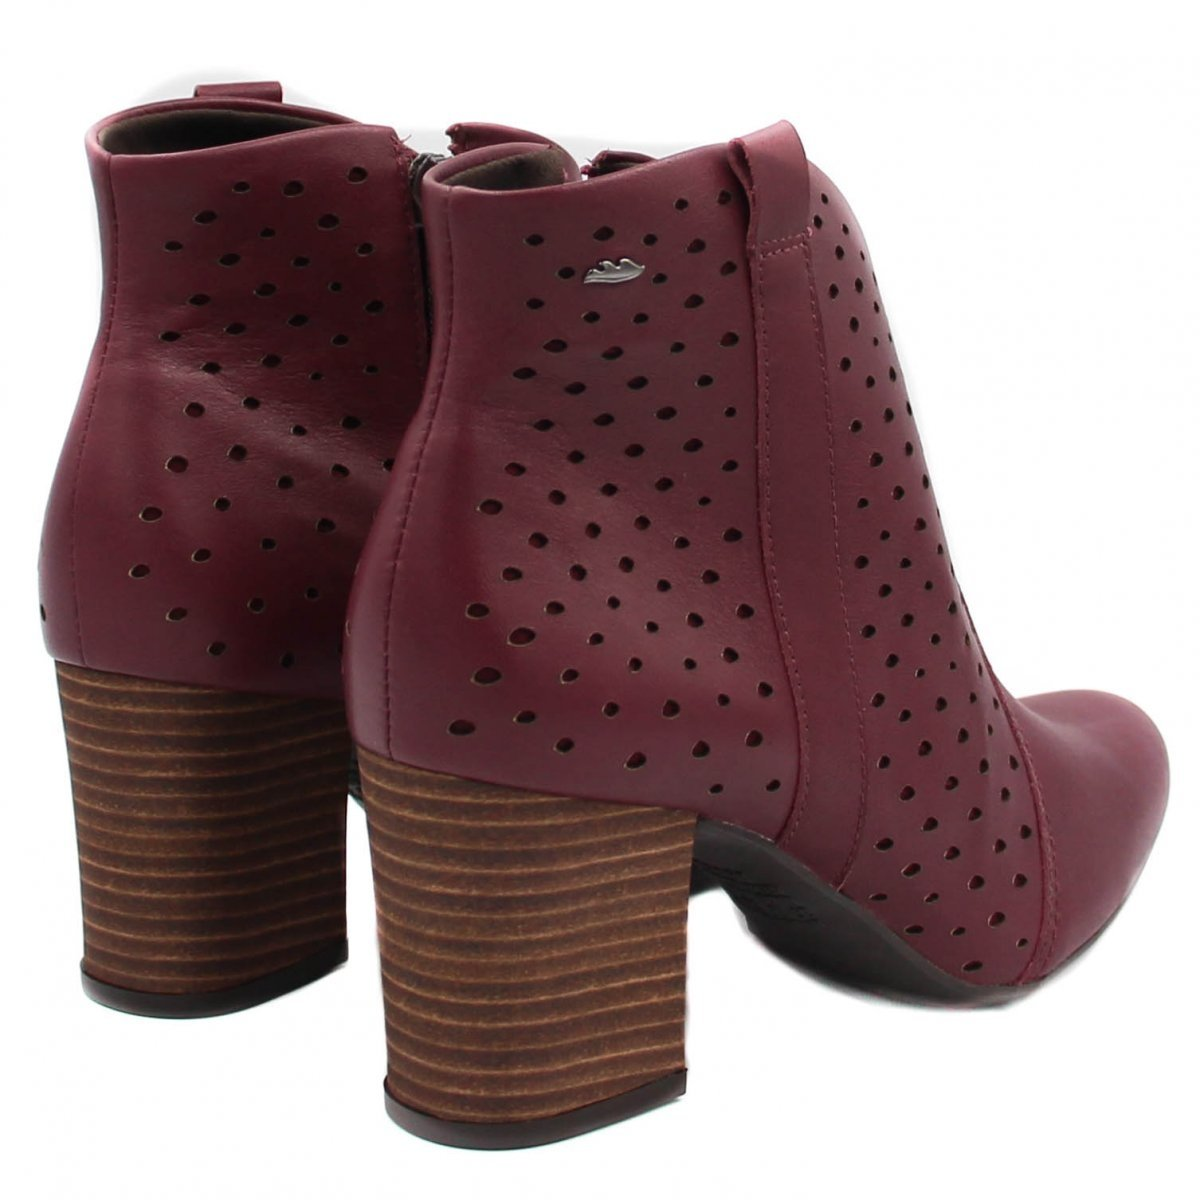 Bota Cano Curto Dakota Ankle Boot Zíper Feminina - Vermelho - Compre ... 9606e46c02